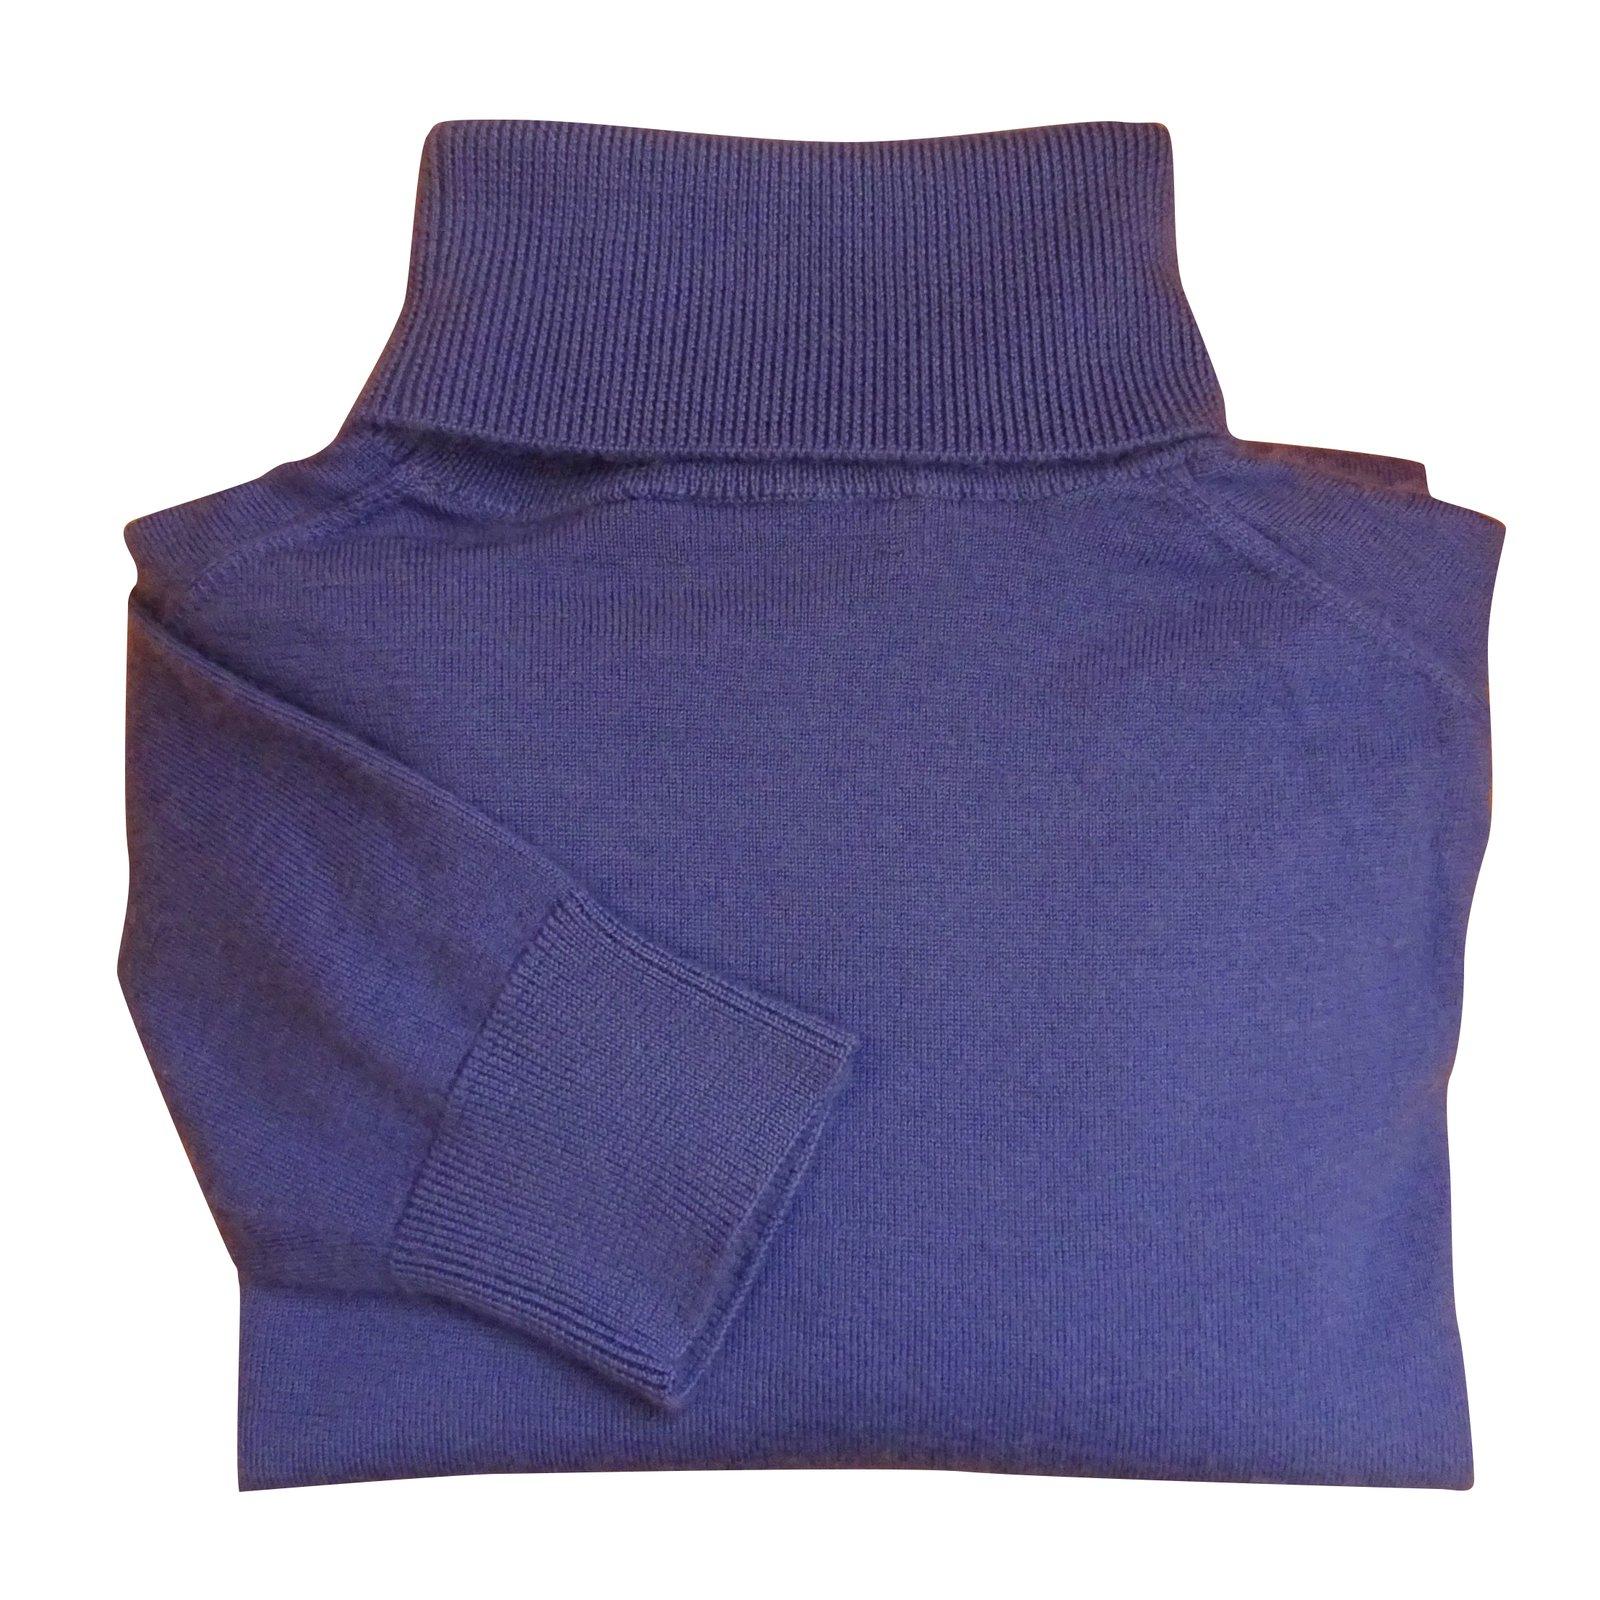 8bc46c1af Polo Ralph Lauren RALPH LAUREN PURPLE LABEL TURTLENECK SWEATER Sweaters  Cashmere Blue ref.98195